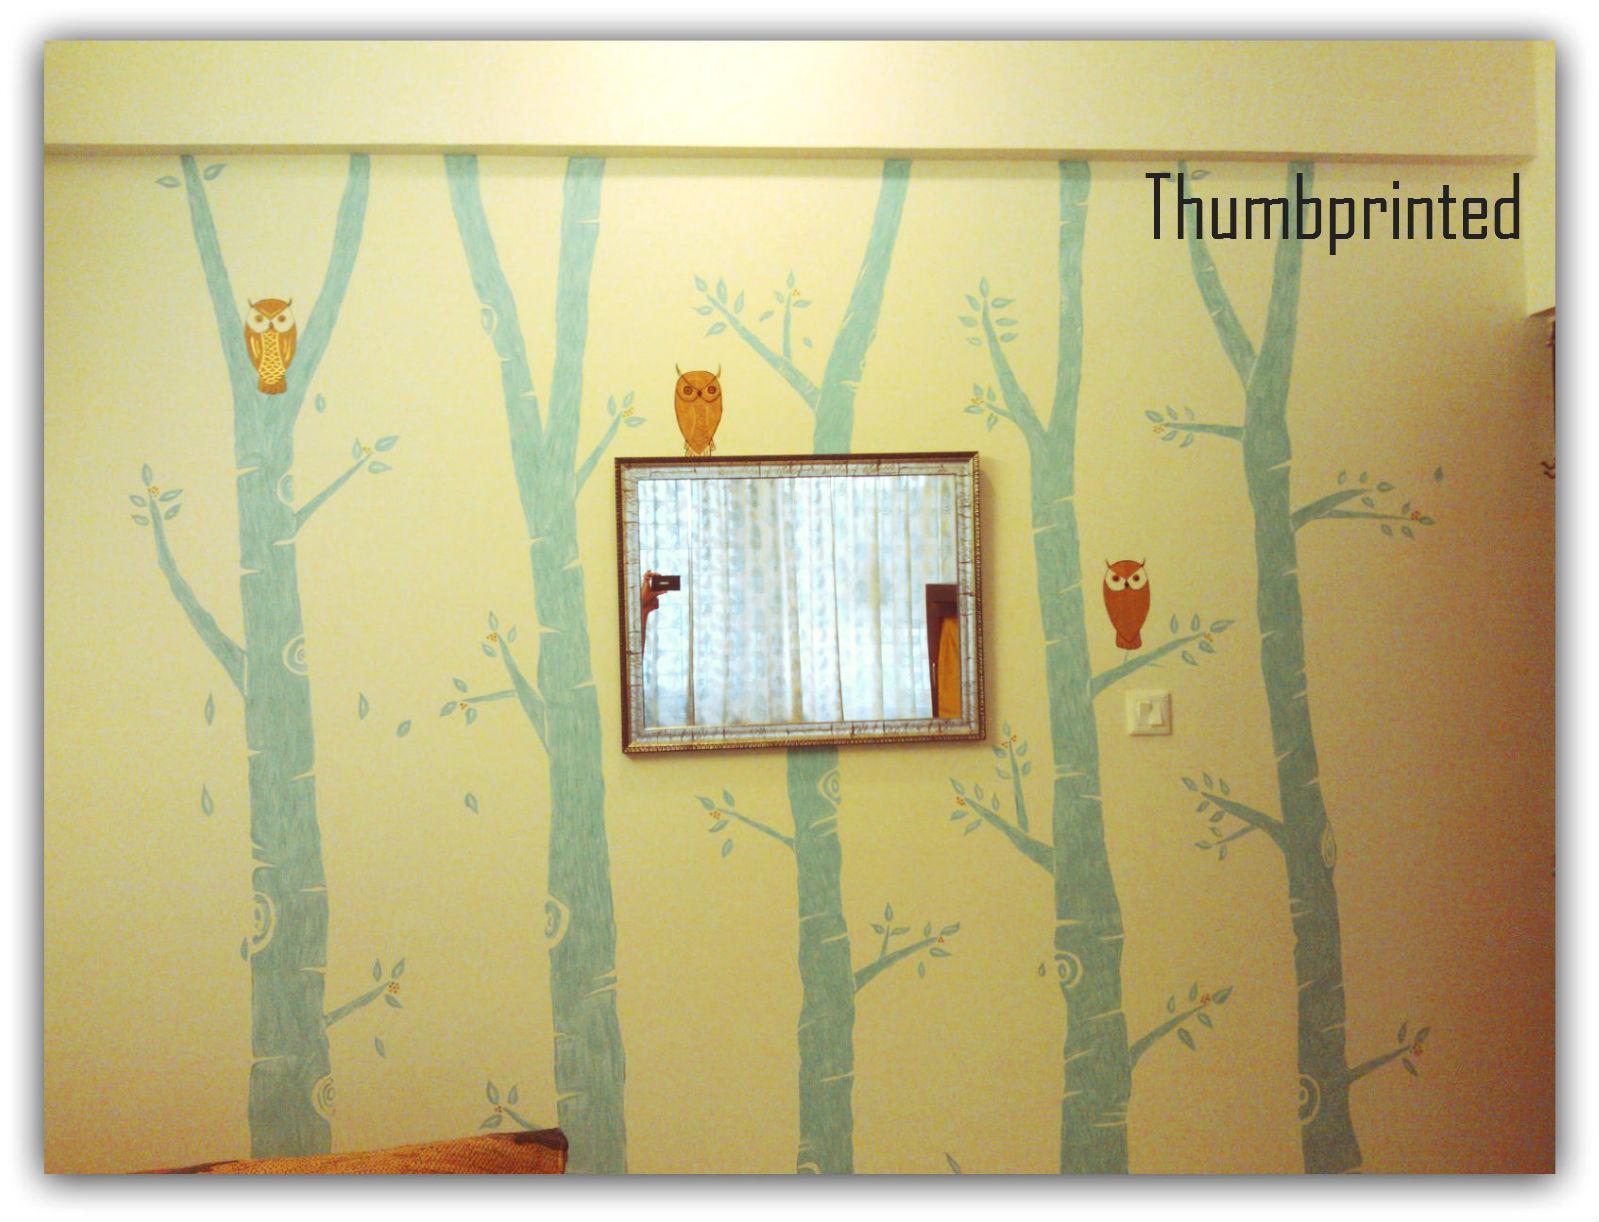 Wall Art | thumbprinted